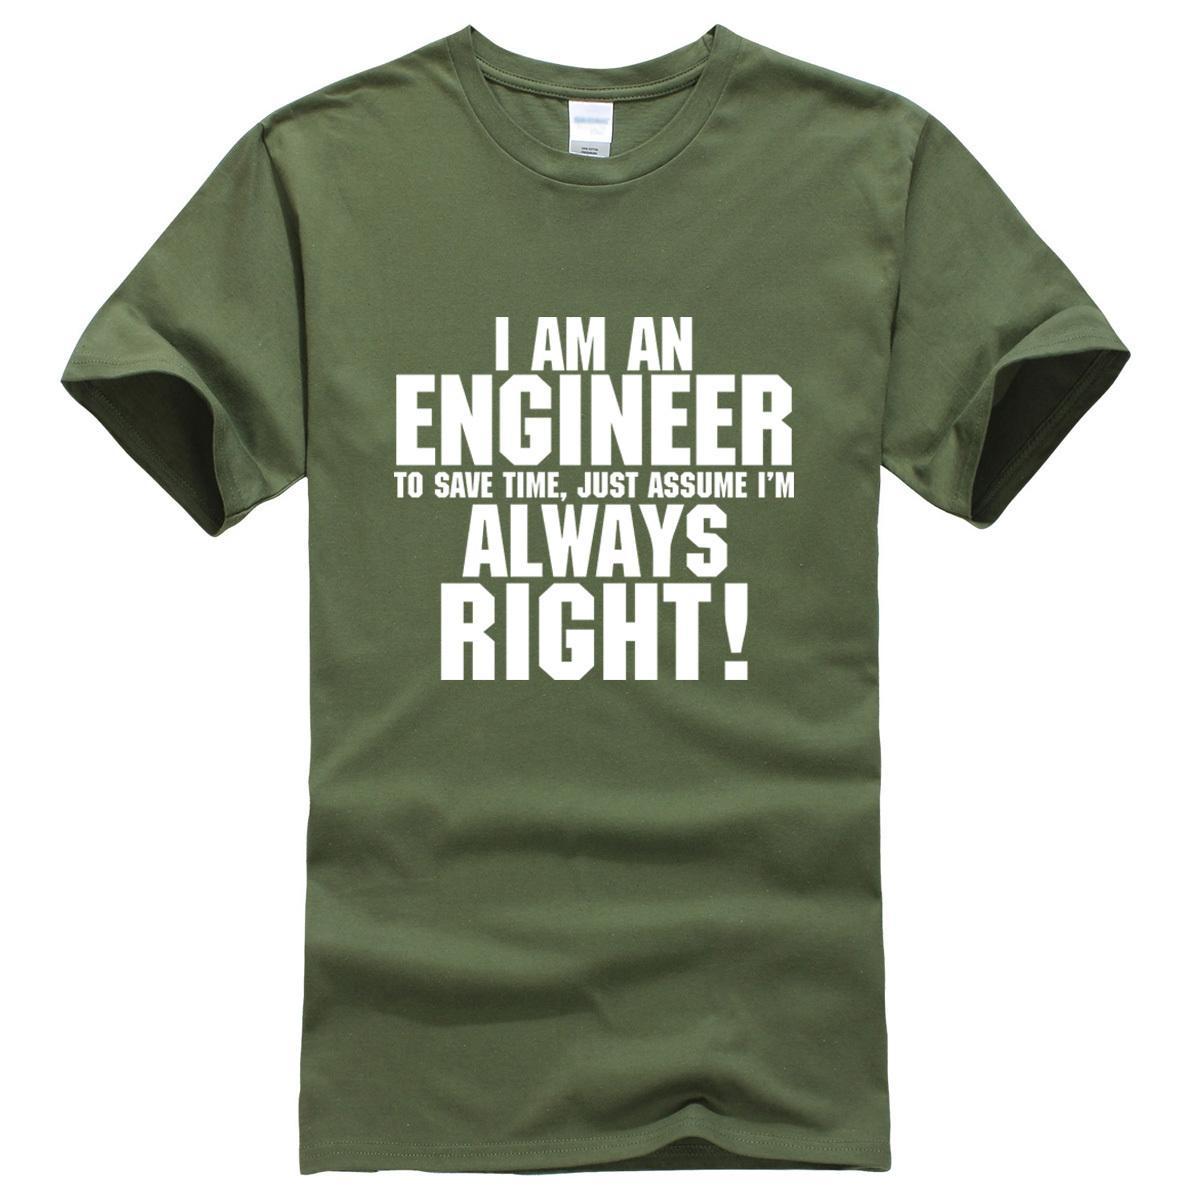 7863bae2 I Am An Engineer Printed Letter Summer 2019 Men's T-shirts Short Sleeve  Cotton T Shirt Men Harajuku Jersey T-shirt Free Shipping